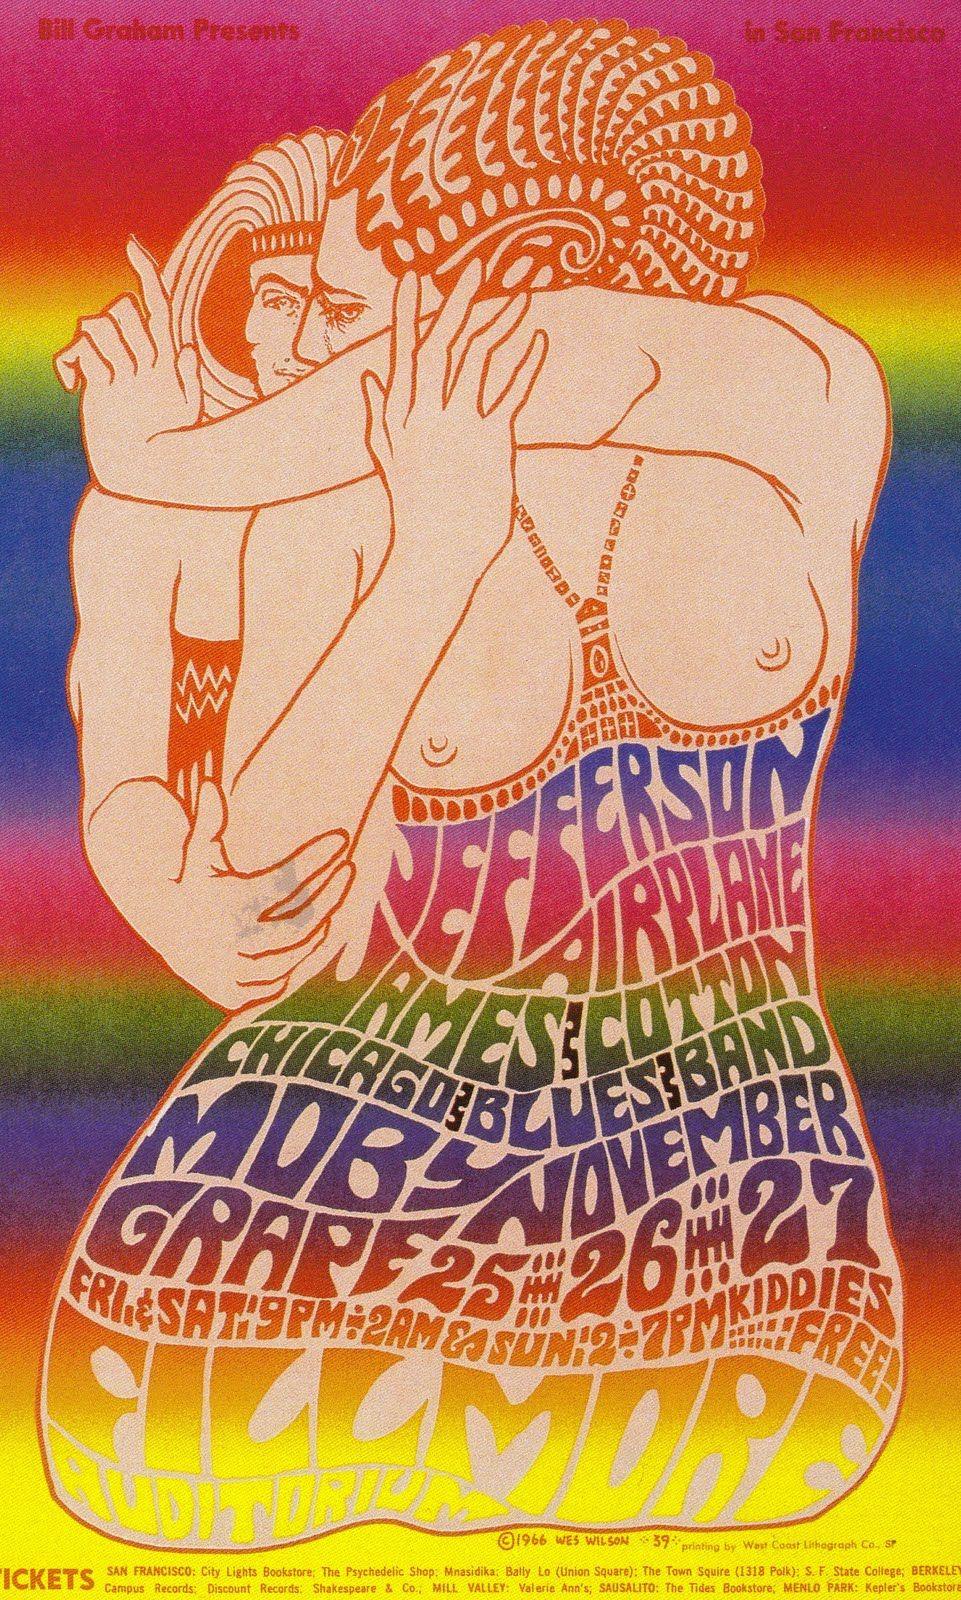 Jefferson Airplane, James Cotton, Chicago Blues Band, Moby Grape  San Francisco - Fillmore Auditorium - 1966